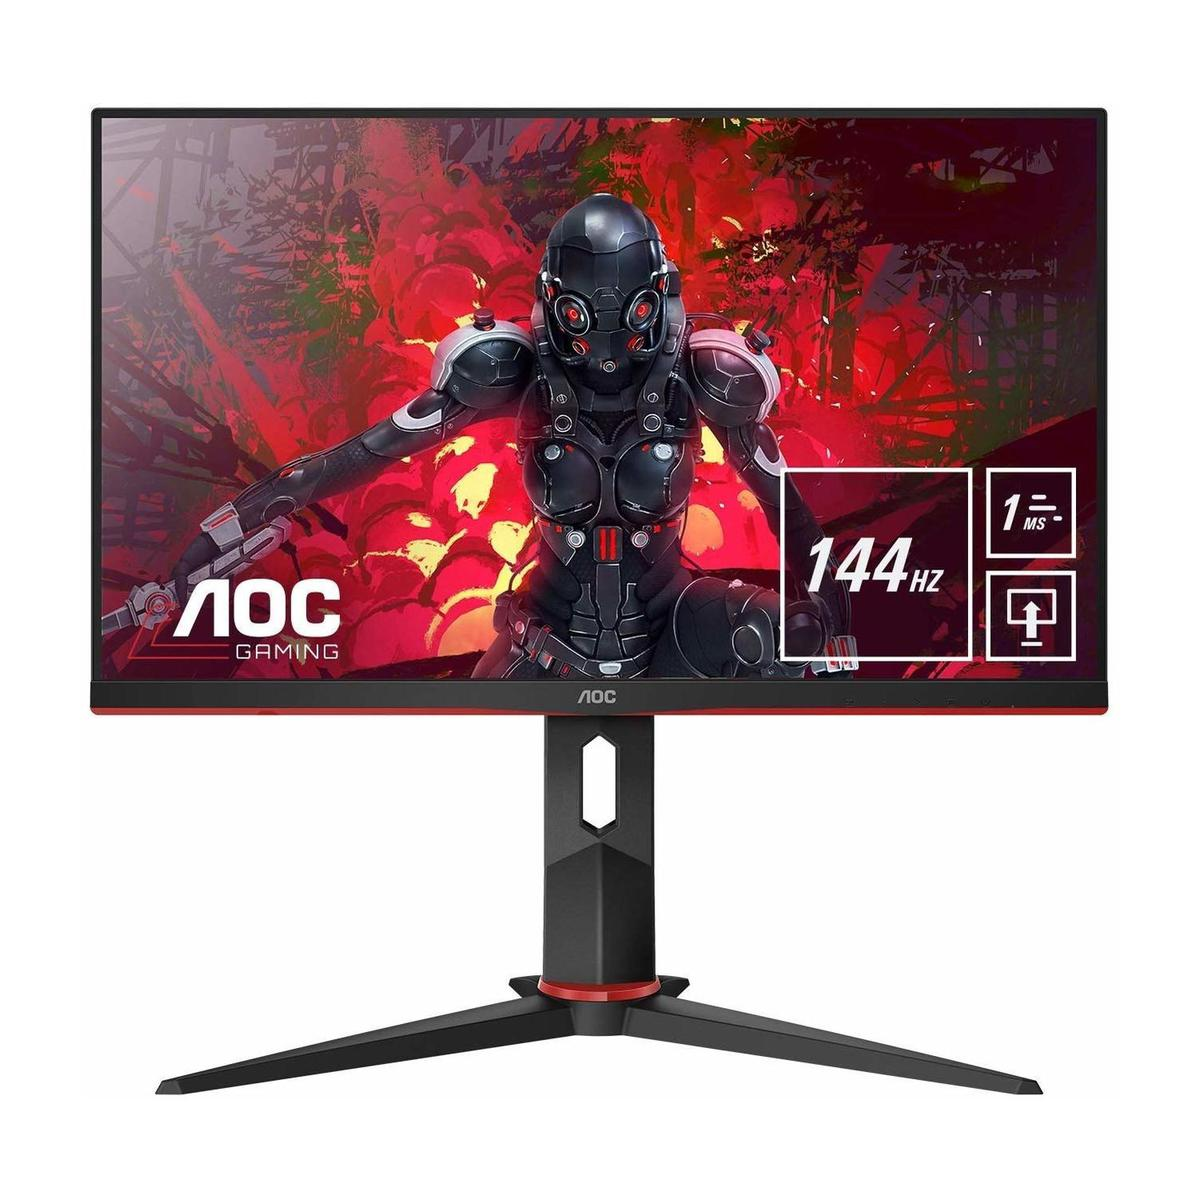 "AOC Q27G2U/BK 27.0"" 2560x1440 144 Hz Monitor"